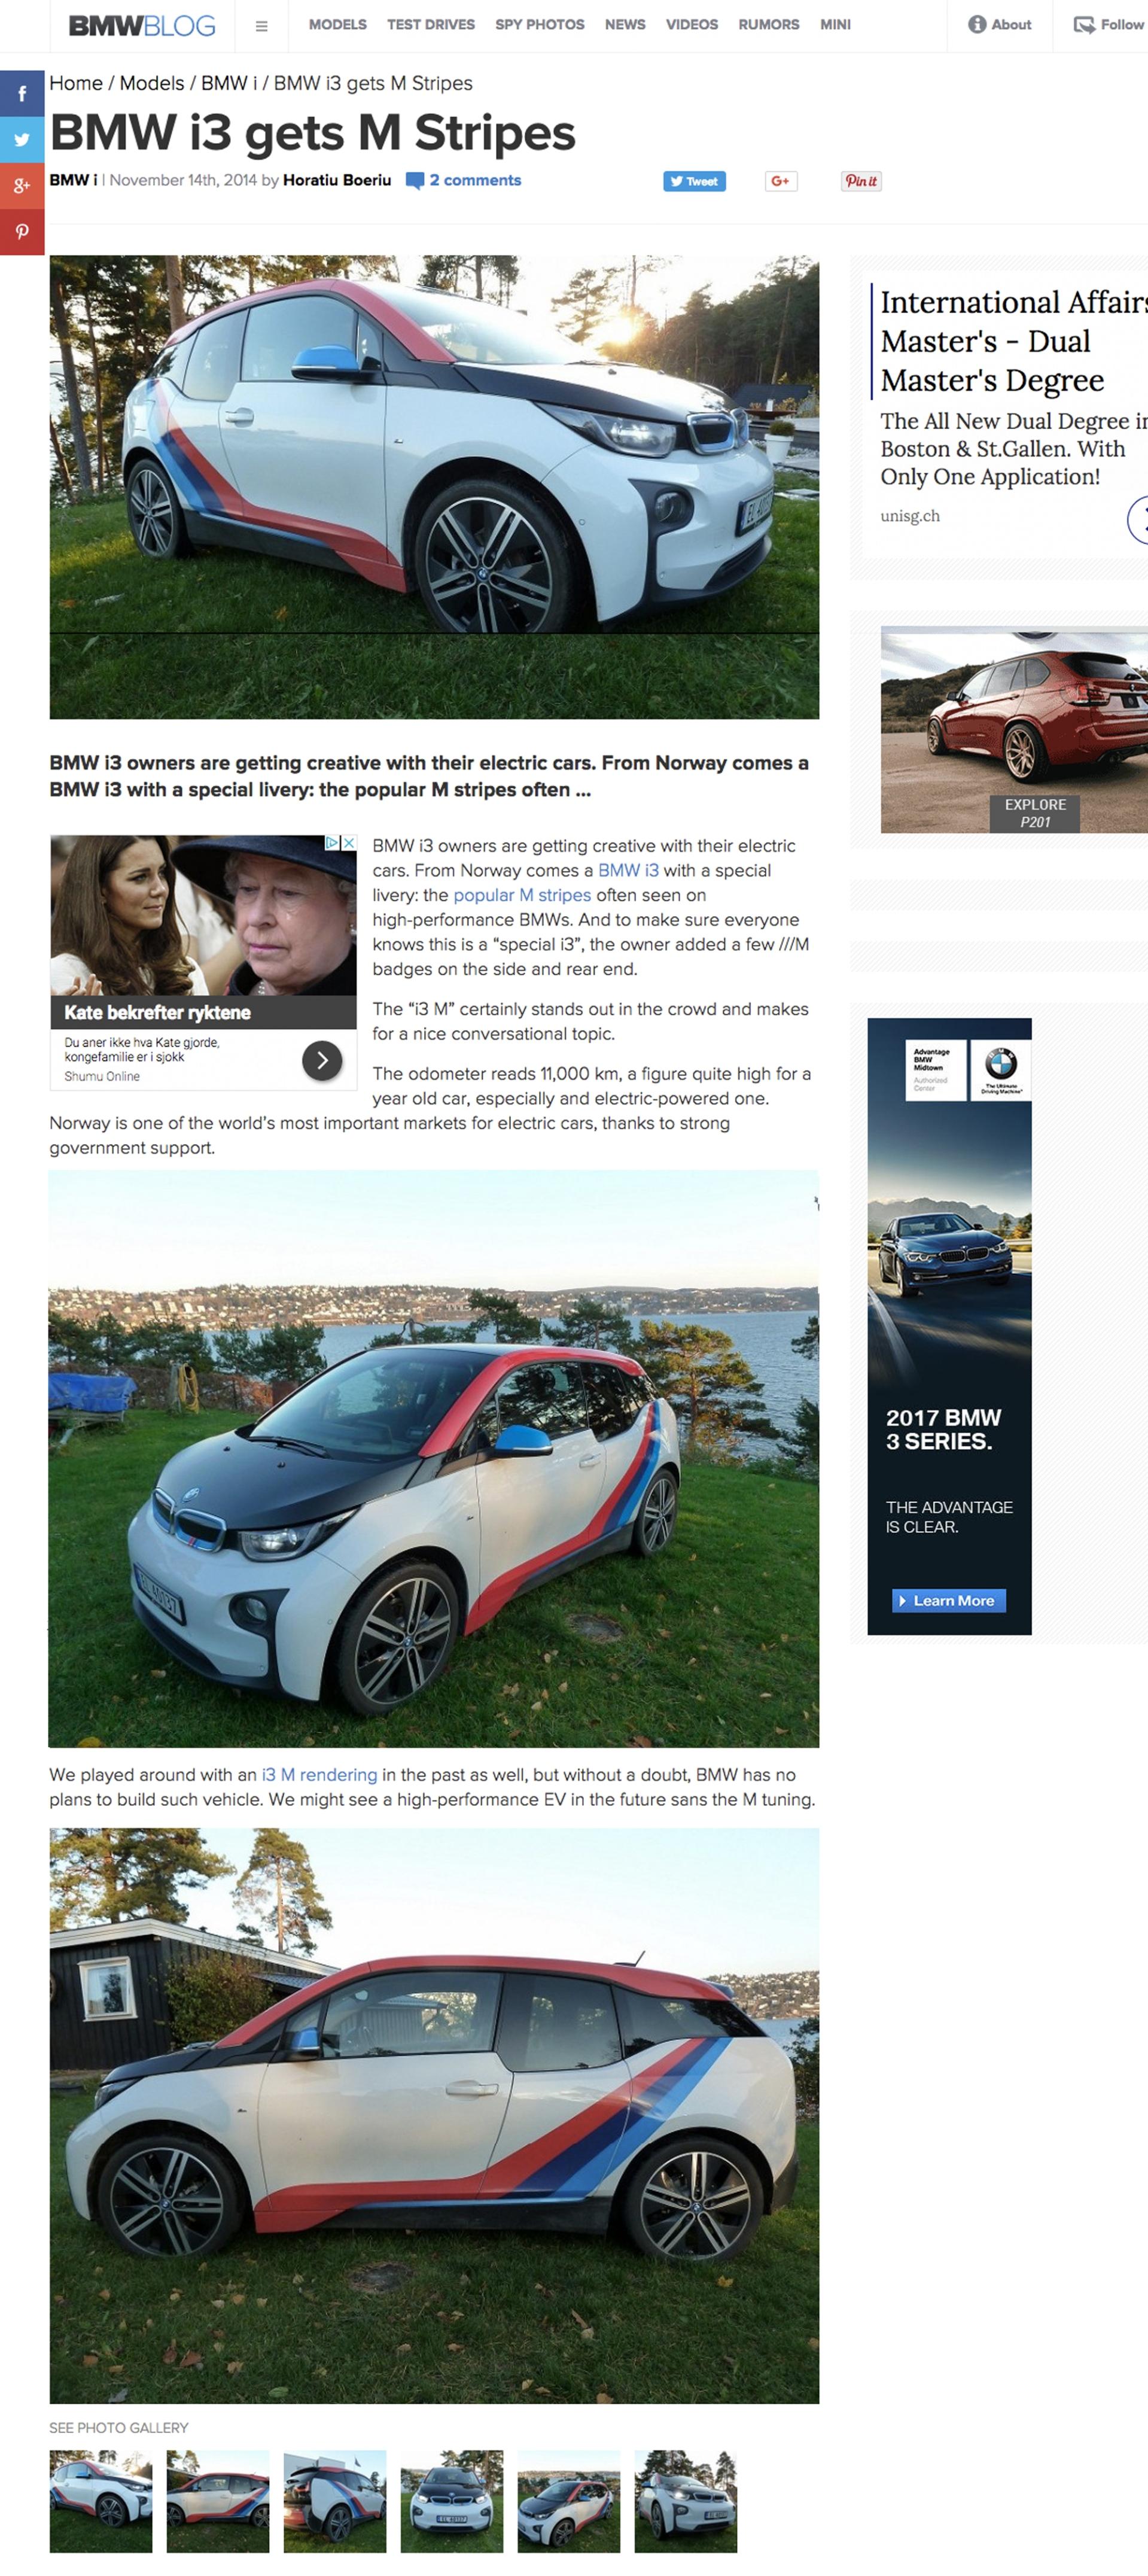 BMWblogg